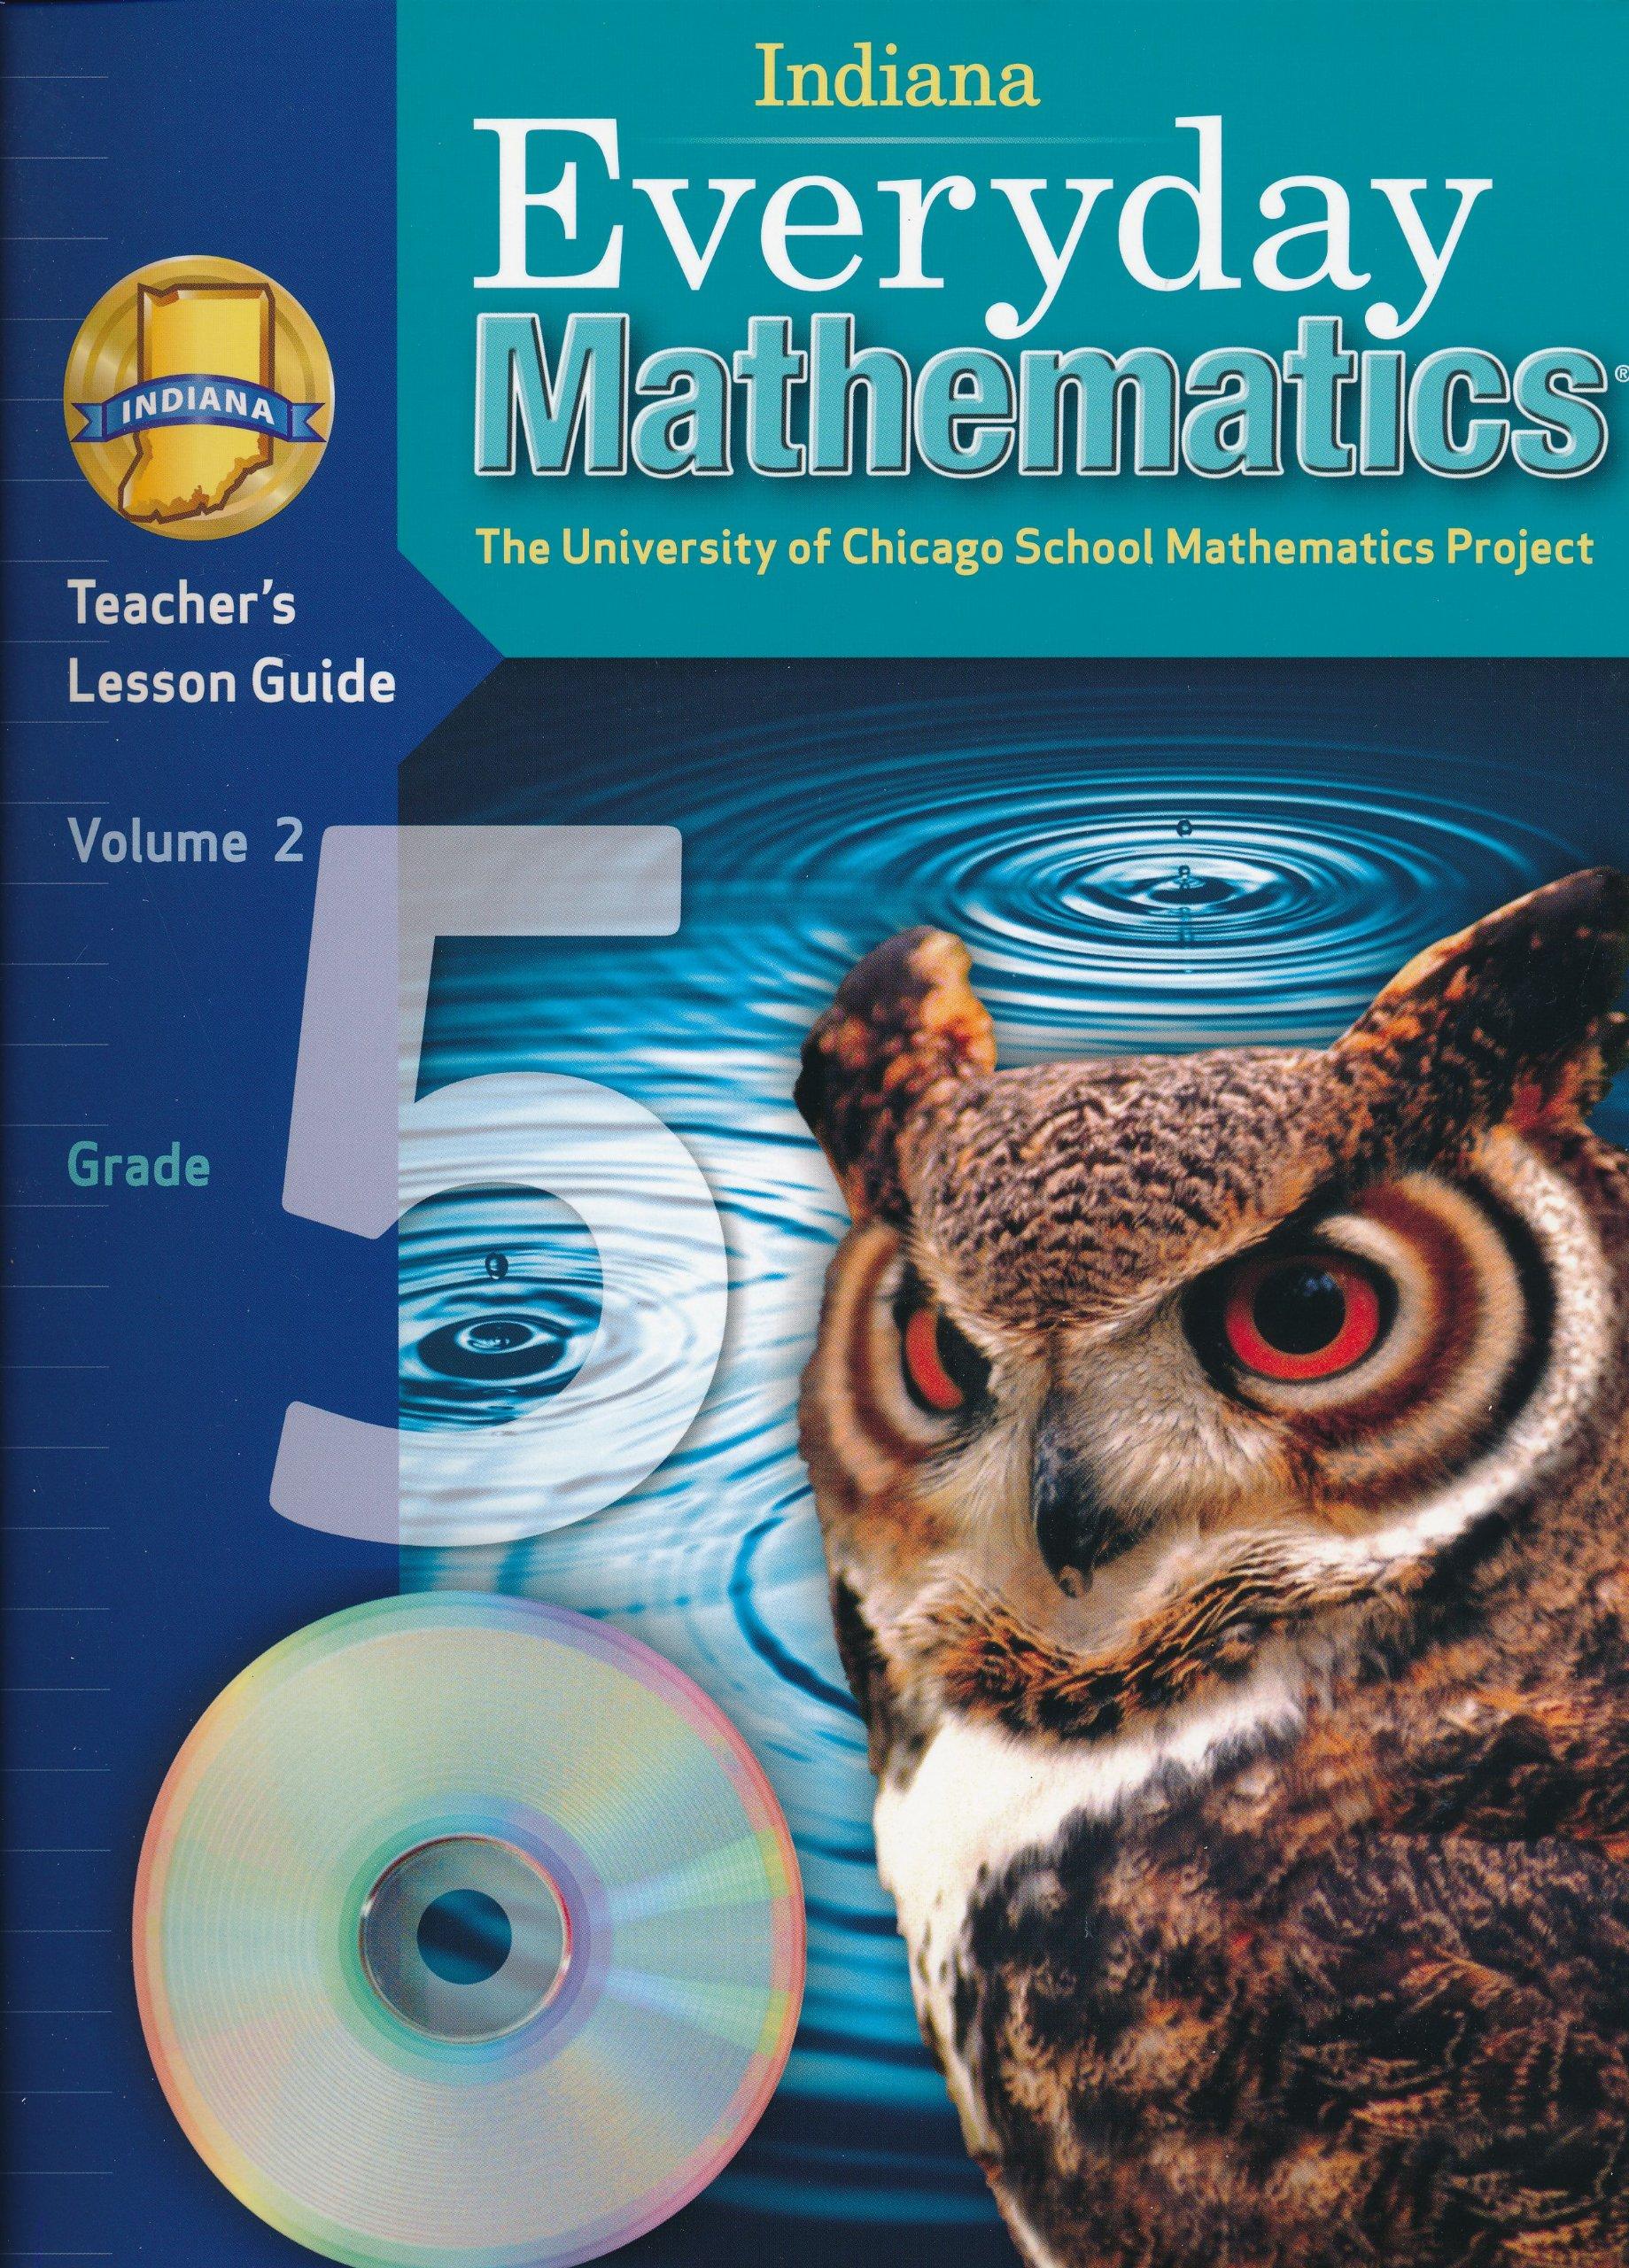 Download Indiana Everyday Mathematics Teacher's Lesson Guide Grade 5 Volume 2 PDF